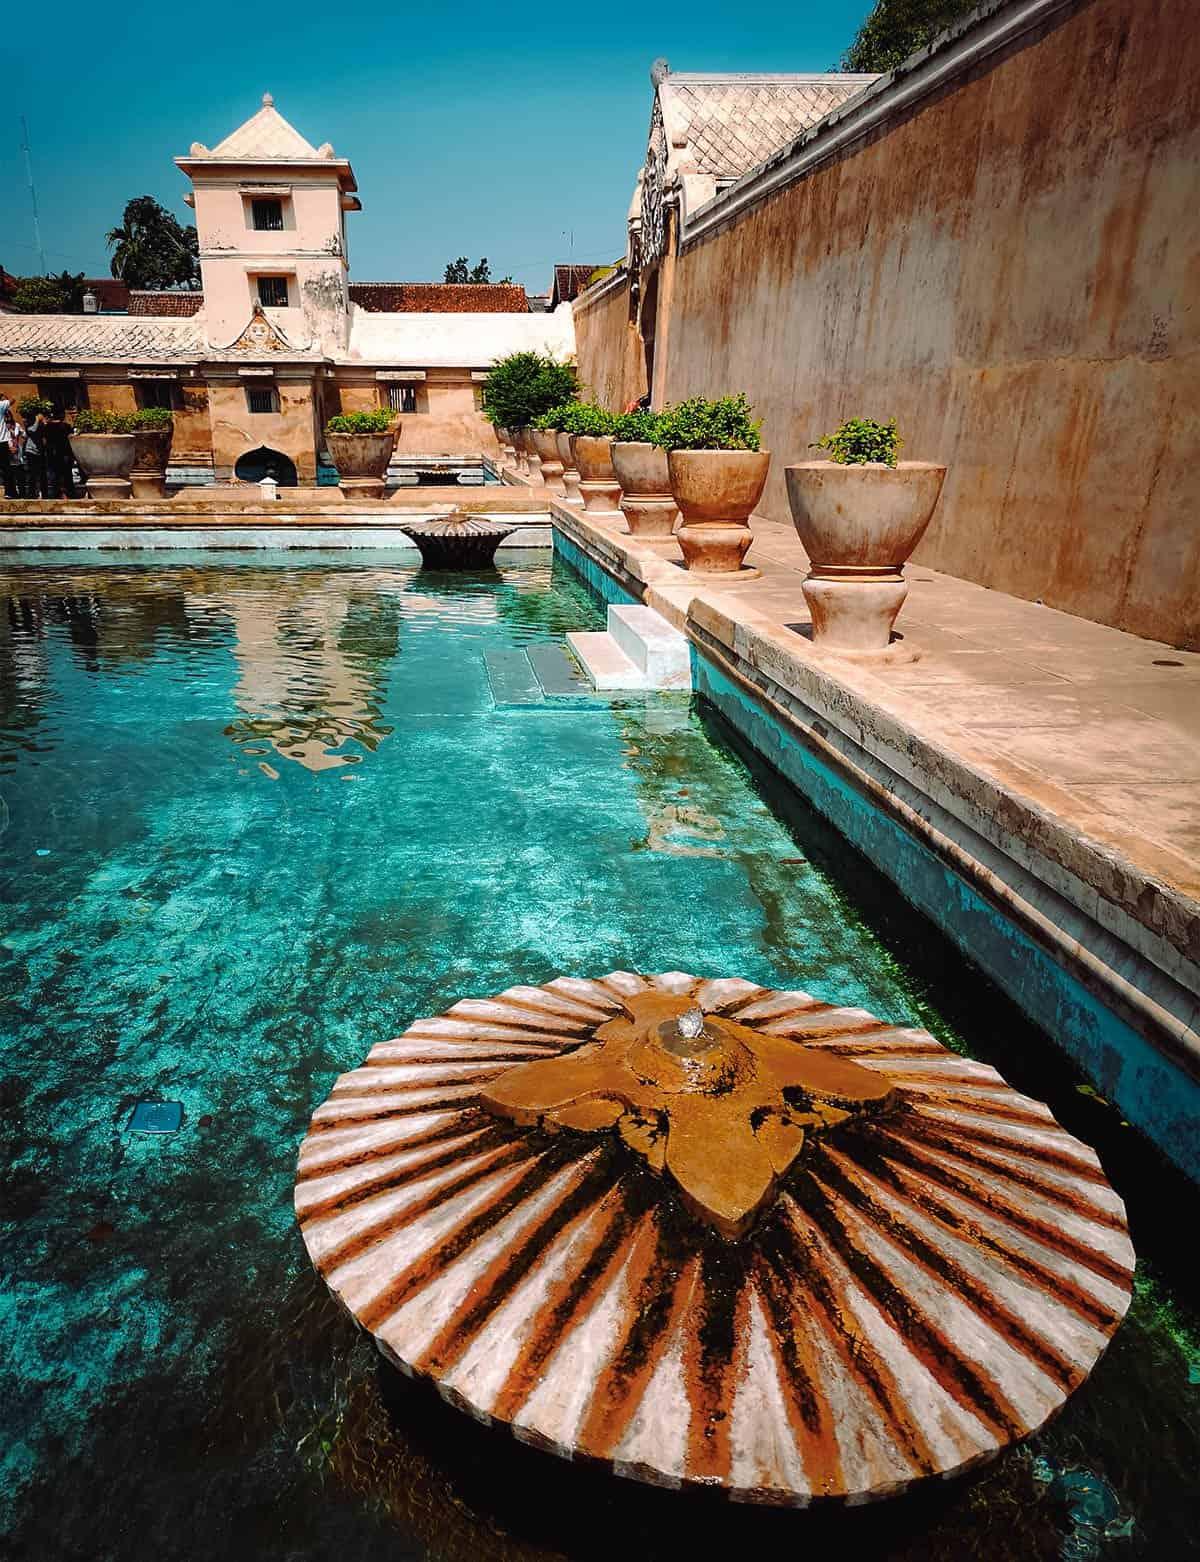 Taman Sari Water Castle, Yogyakarta, Indonesia